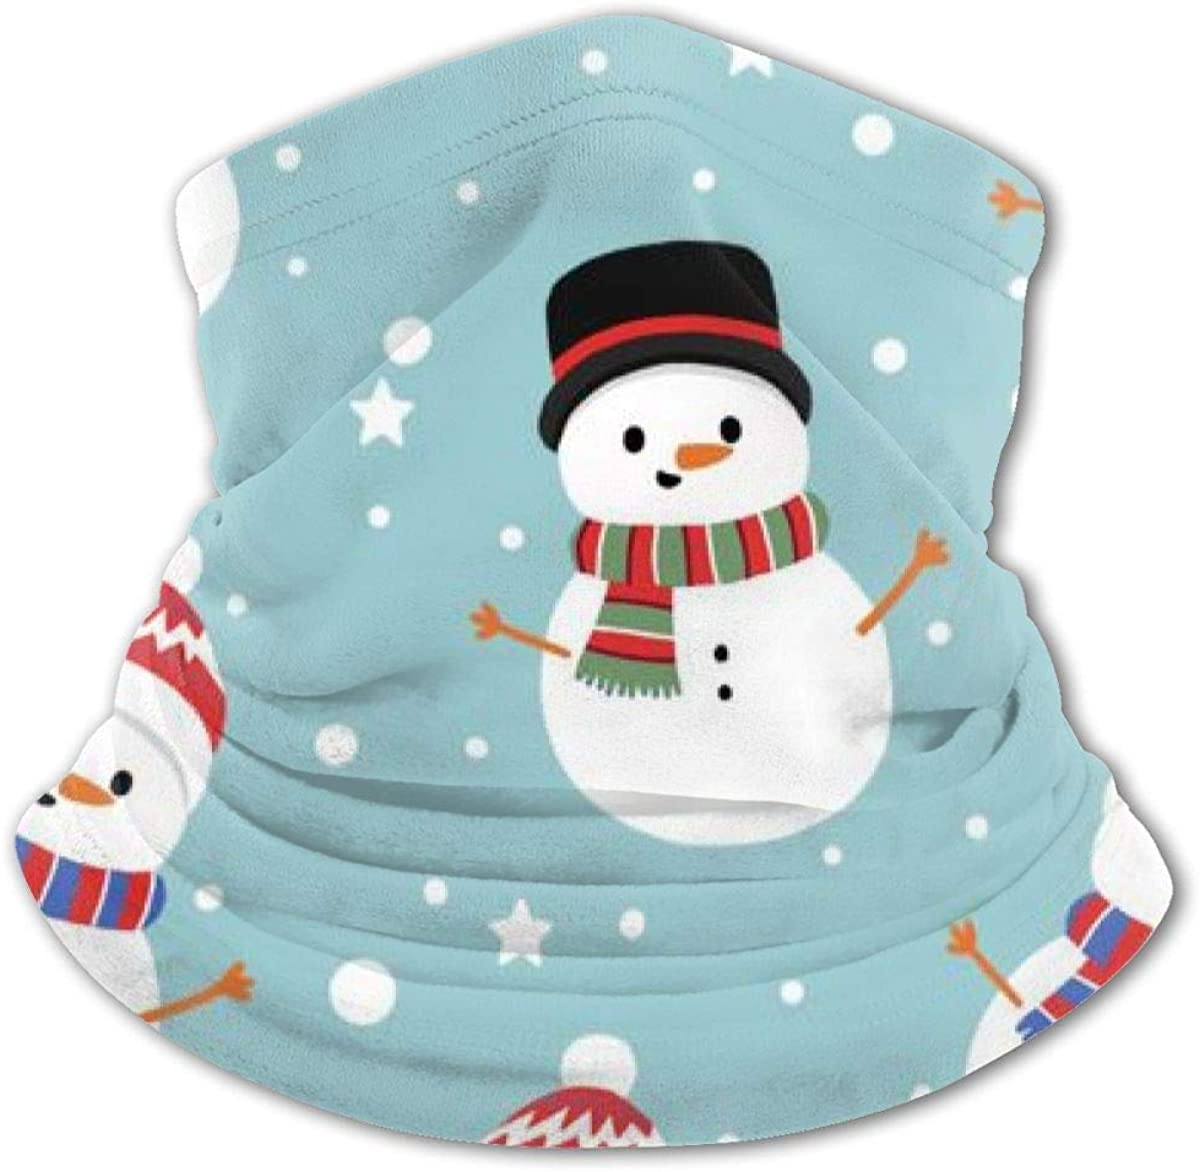 A Joyful Christmas Headwear For Girls And Boys, Head Wrap, Neck Gaiter, Headband, Tenn Fishing Mask, Magic Scarf, Tube Mask, Face Bandana Mask For Camping Running Cycling